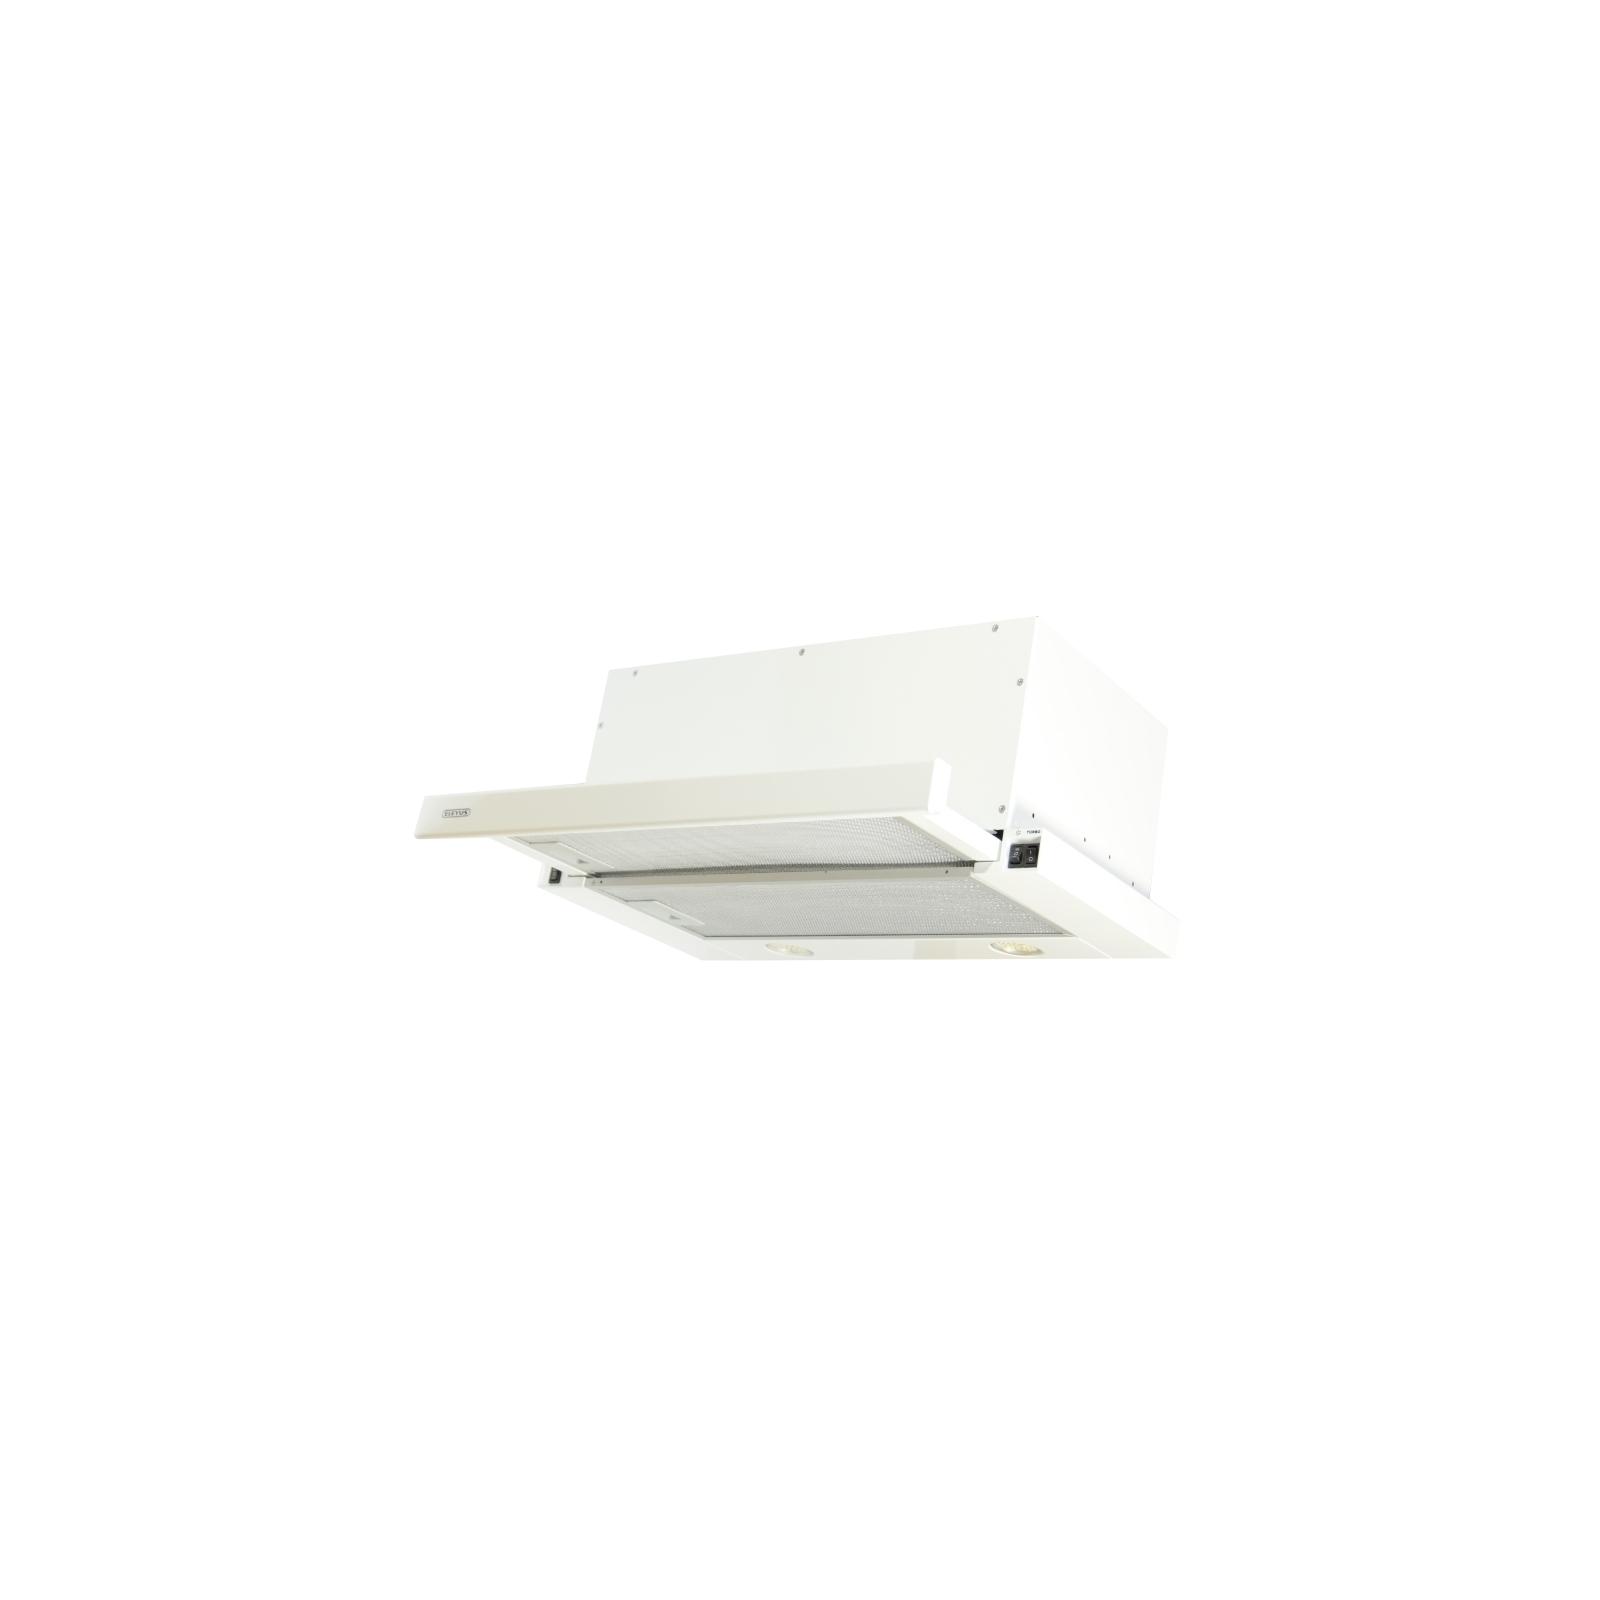 Вытяжка кухонная ELEYUS Storm 1200 LED 60 WH